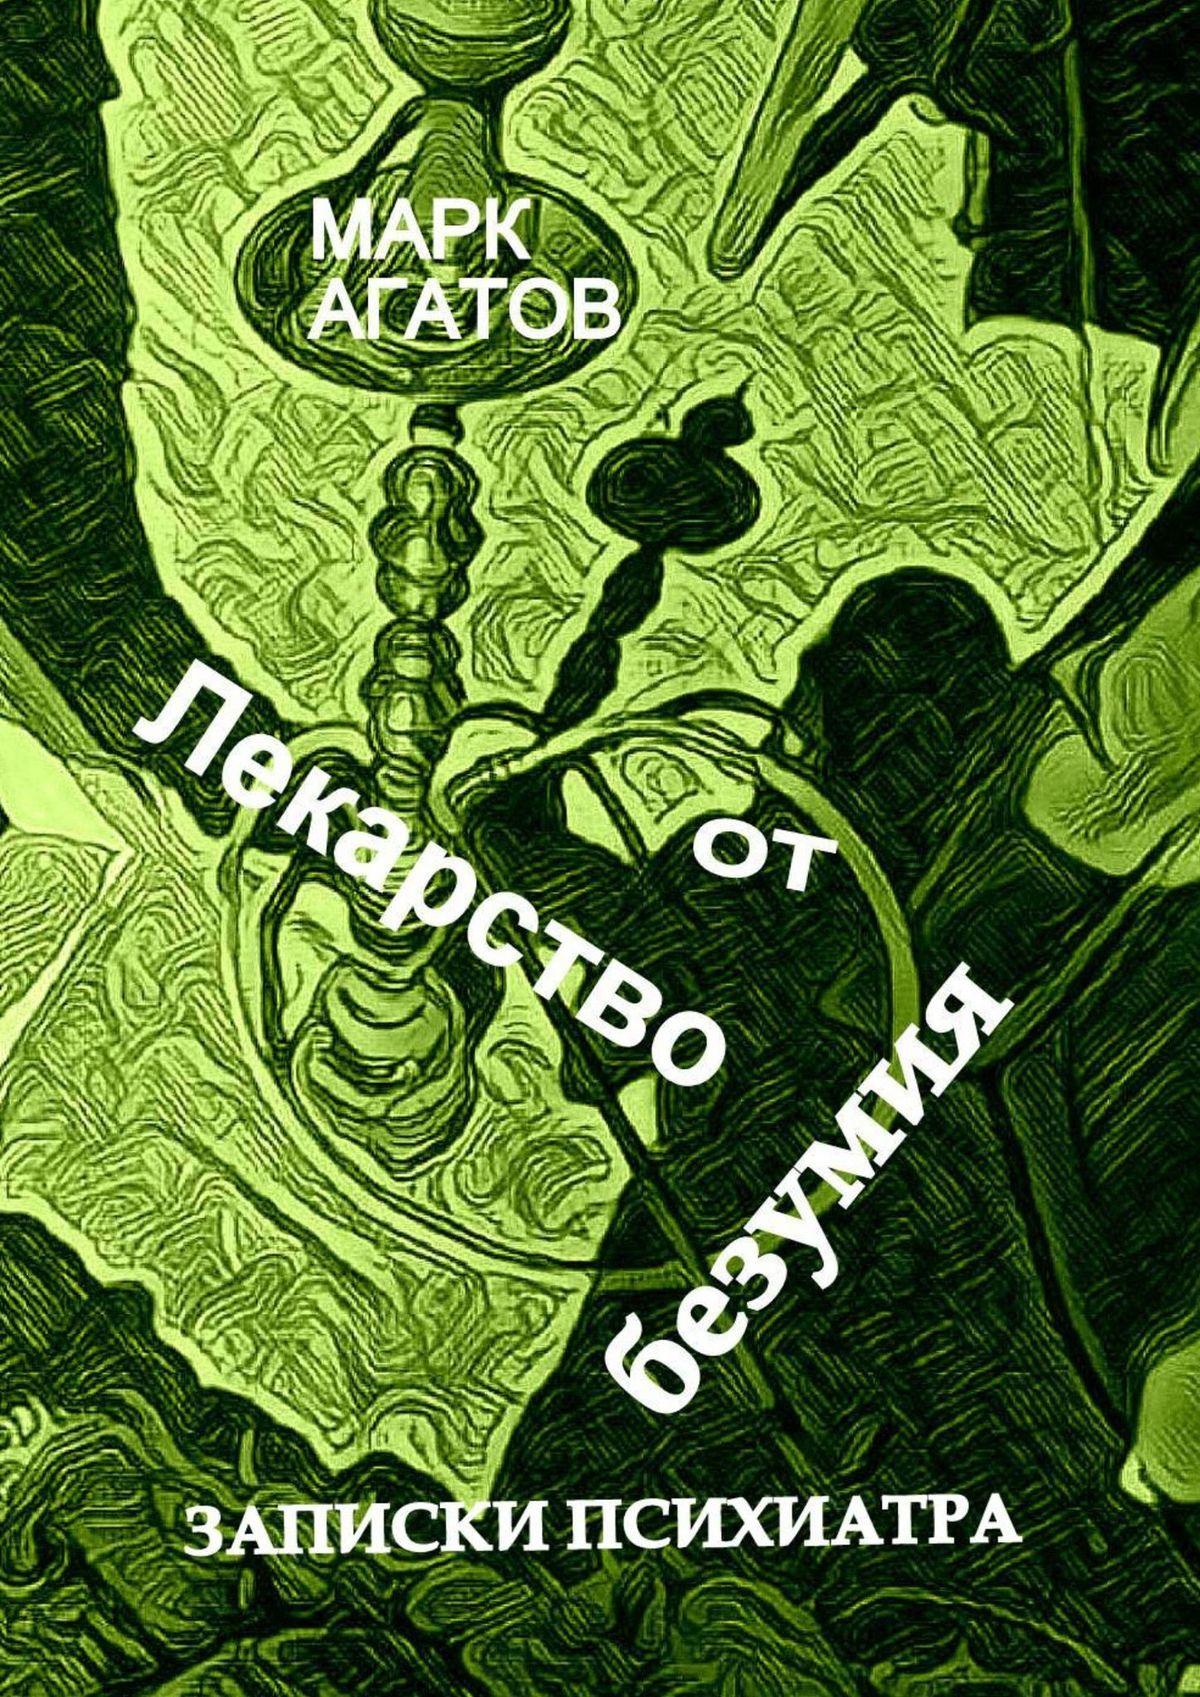 Марк Агатов Лекарство отбезумия. Записки психиатра цена в Москве и Питере